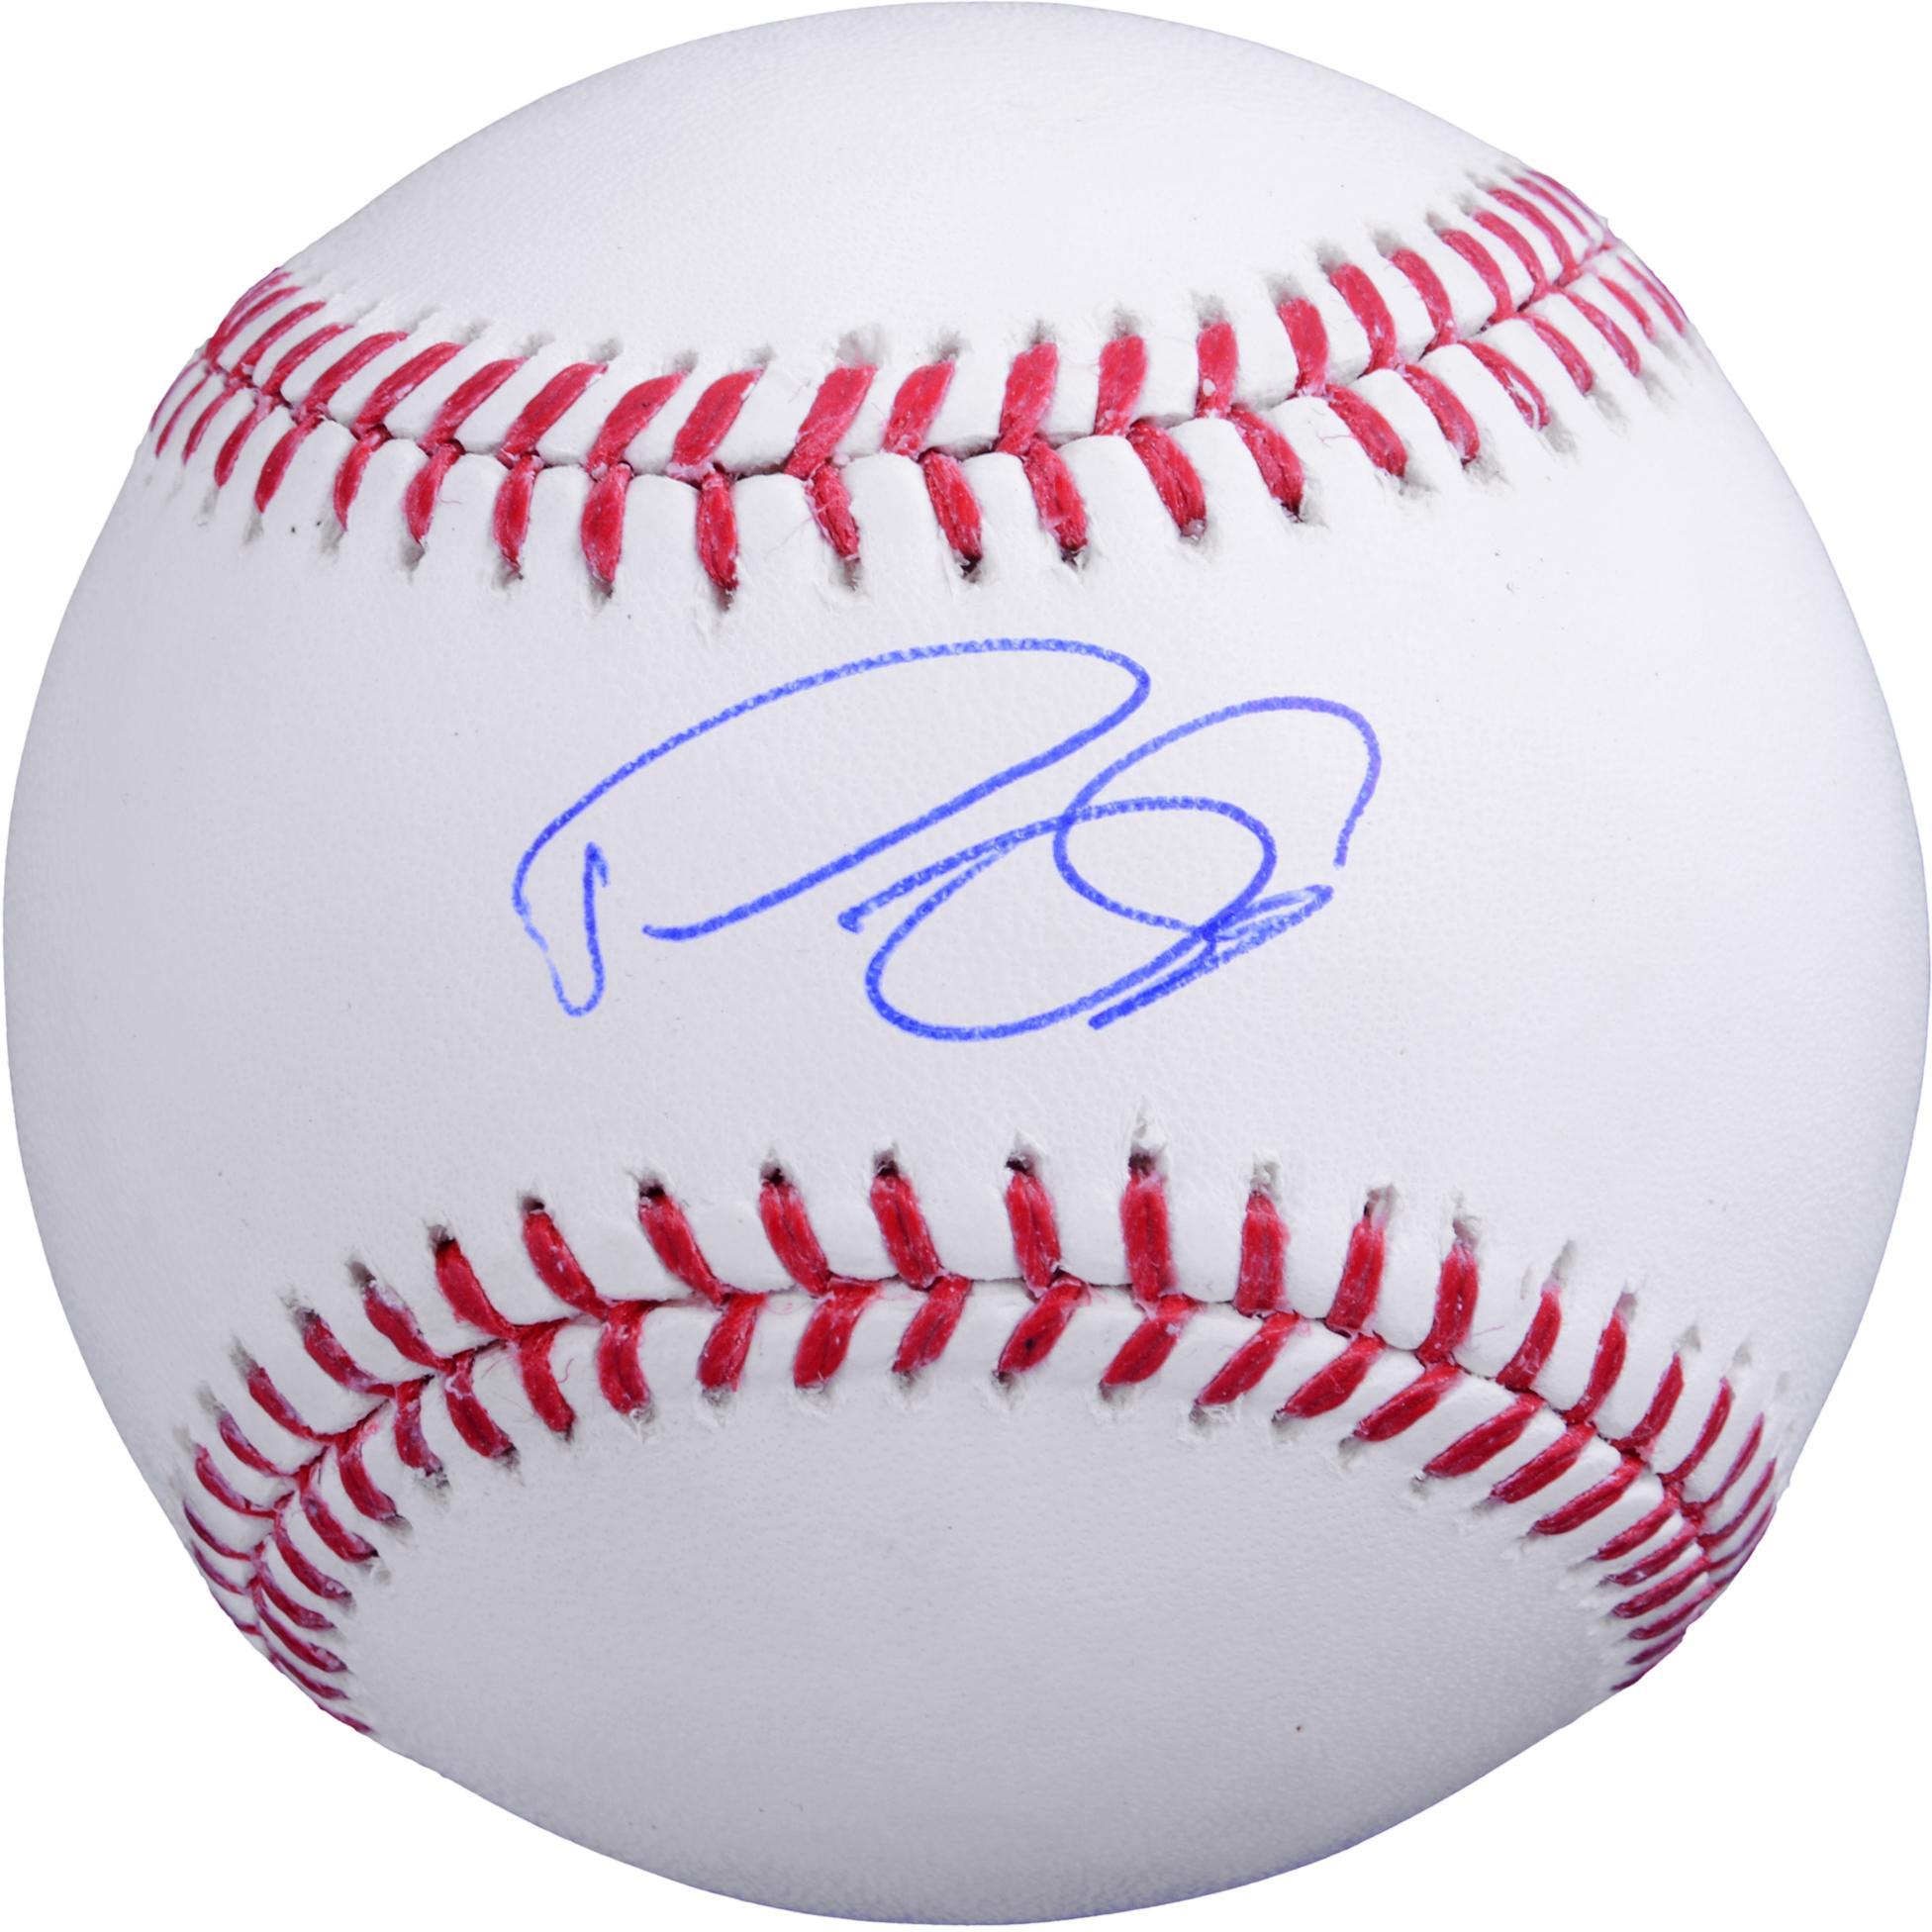 Domingo Santana Houston Astros Autographed Baseball